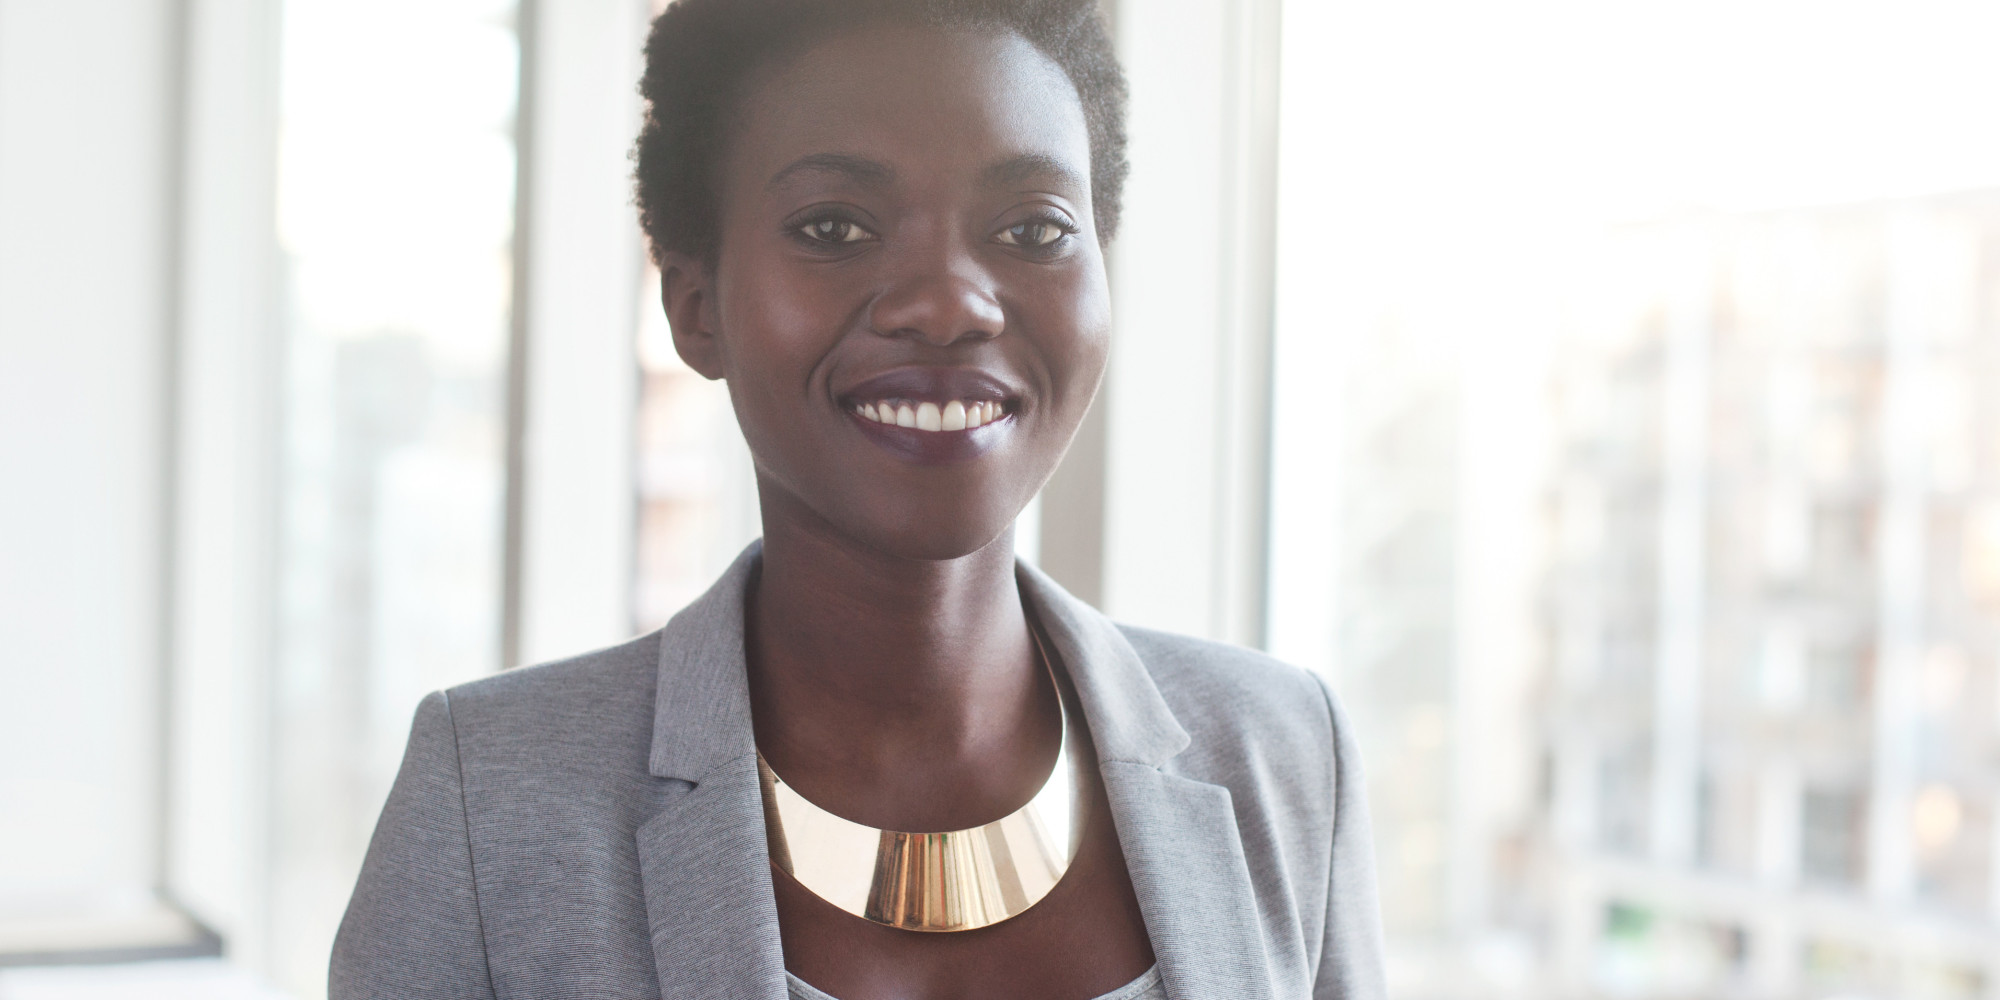 Professional black woman